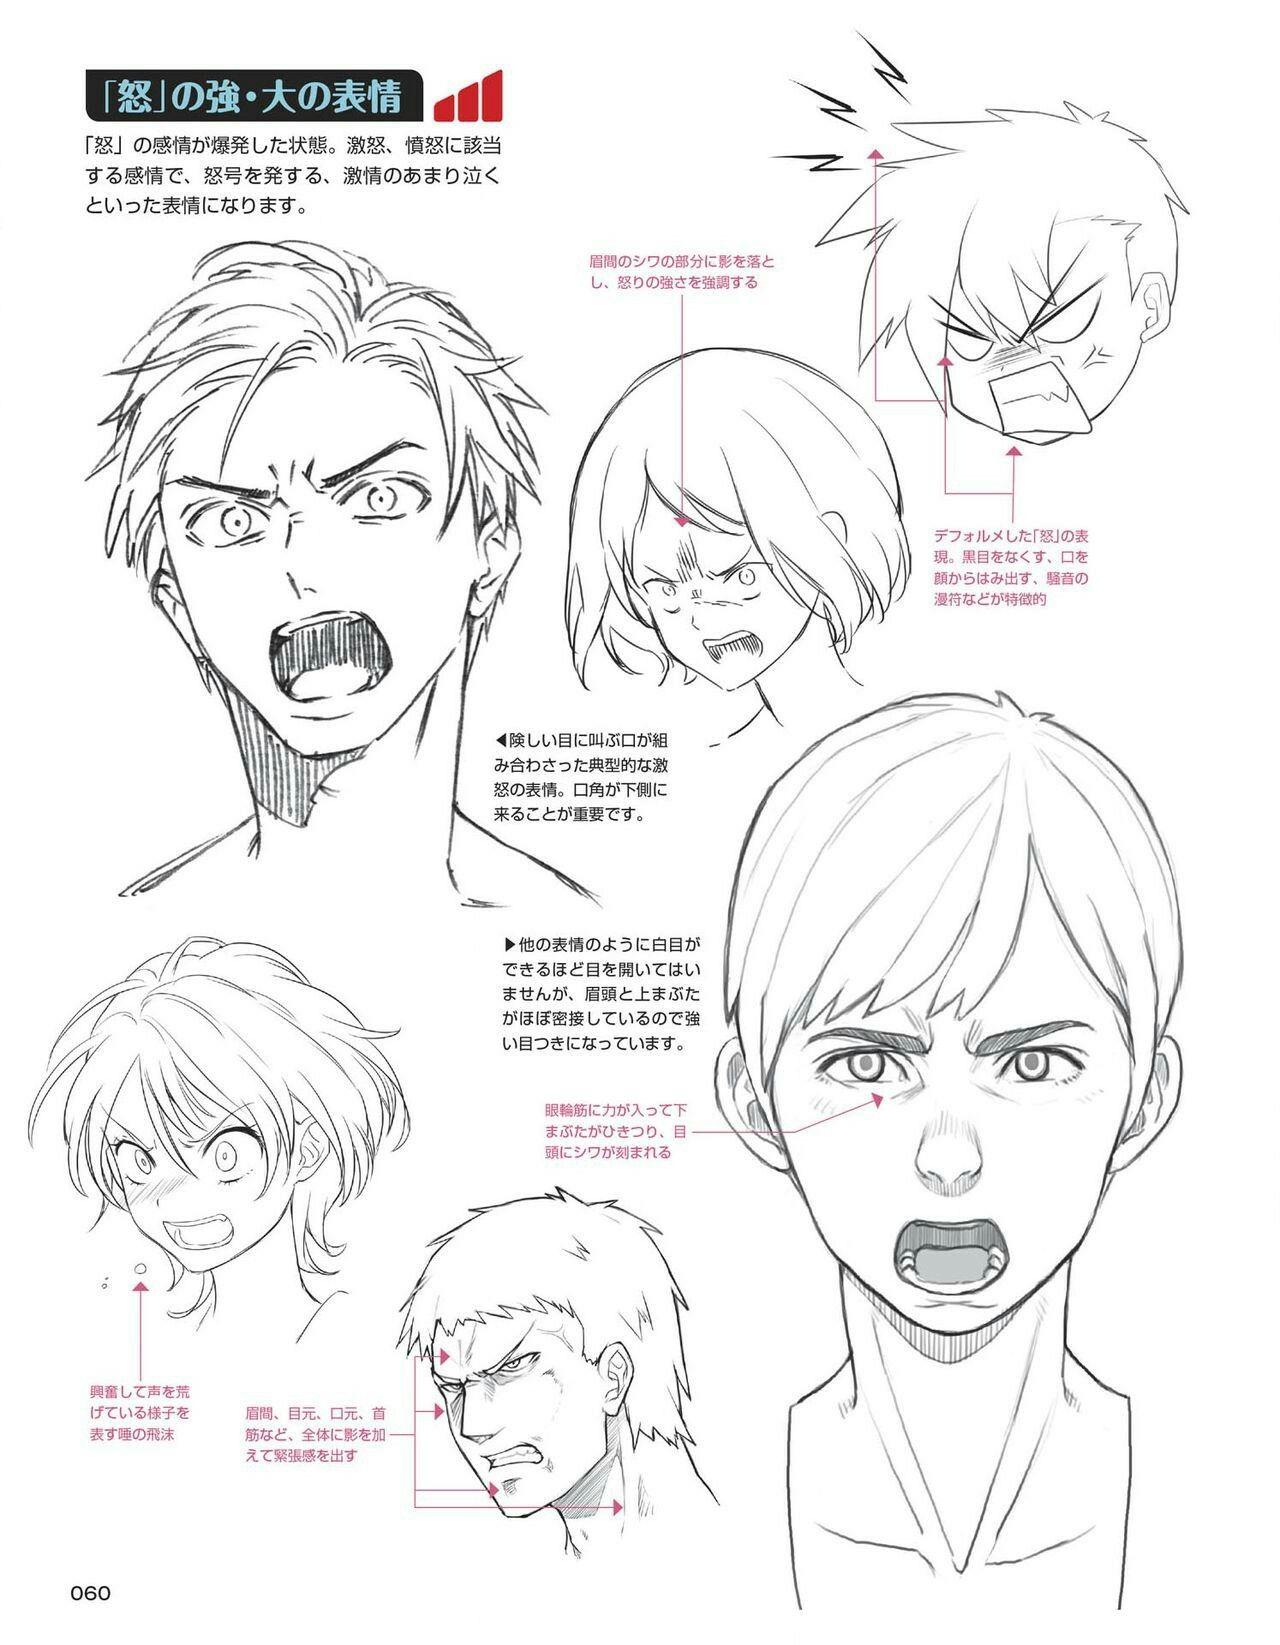 Pin by Unicornio Dog on Design   Pinterest   Draw, Manga and Tutorials